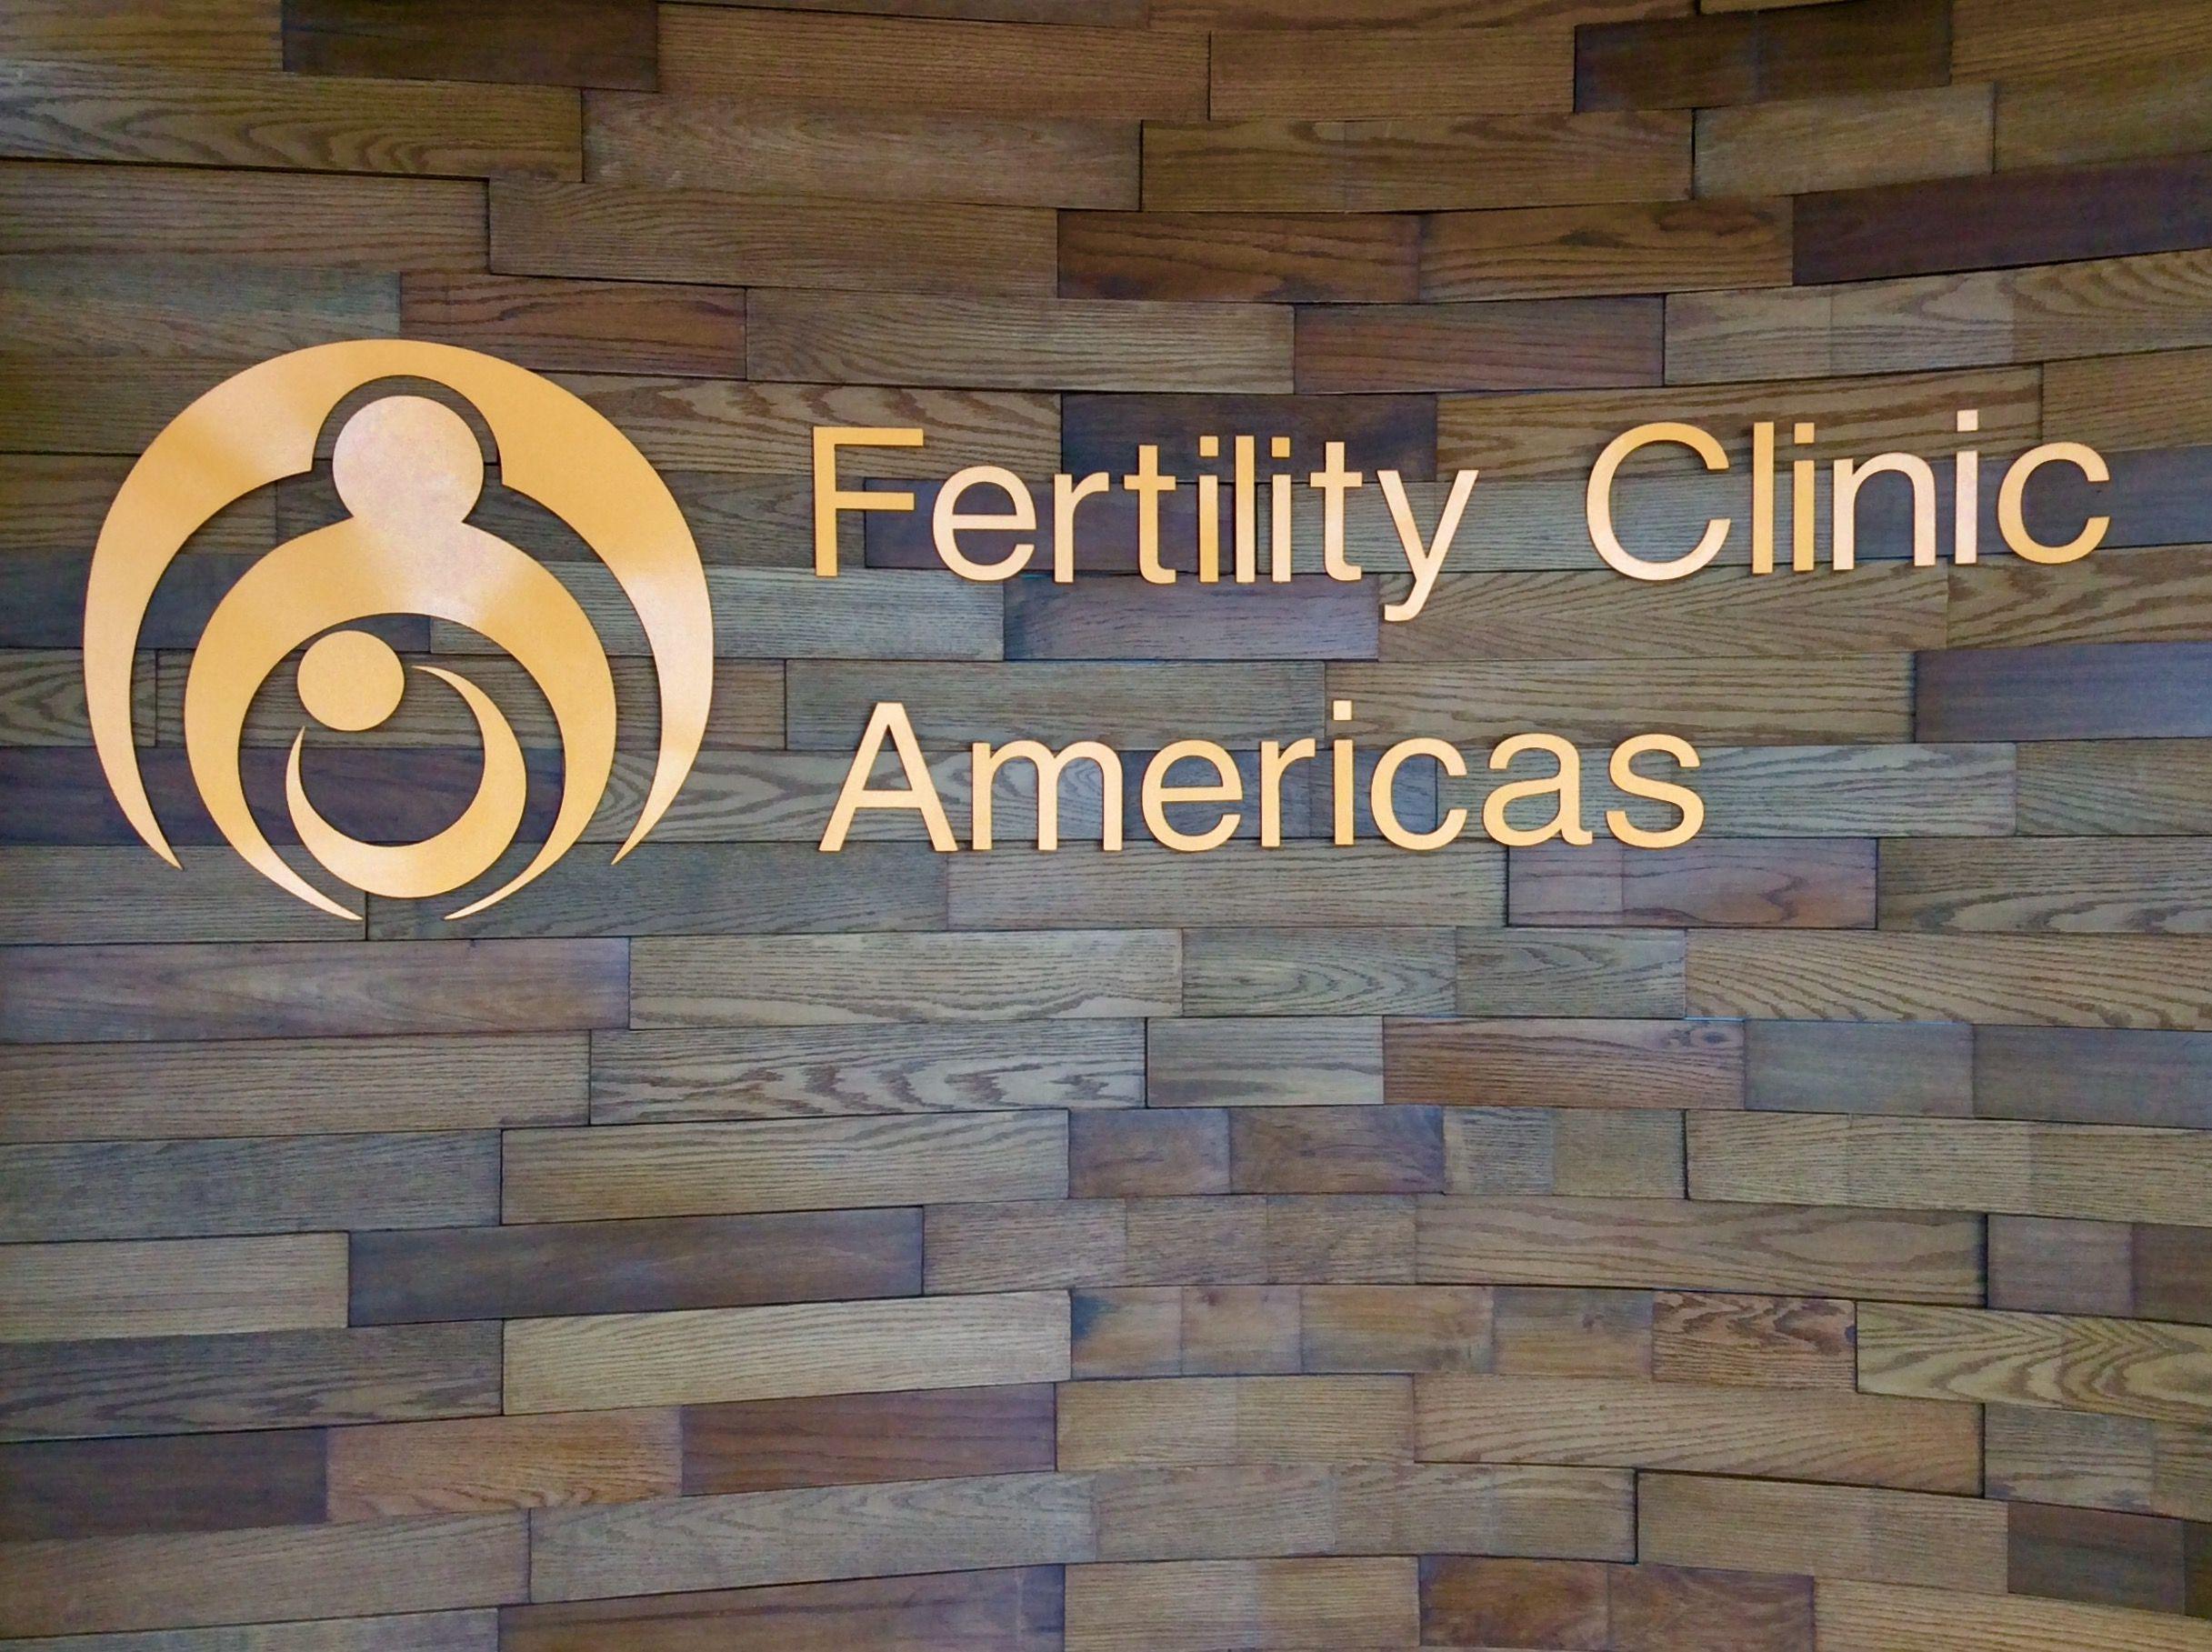 Fertility Clinic Americas